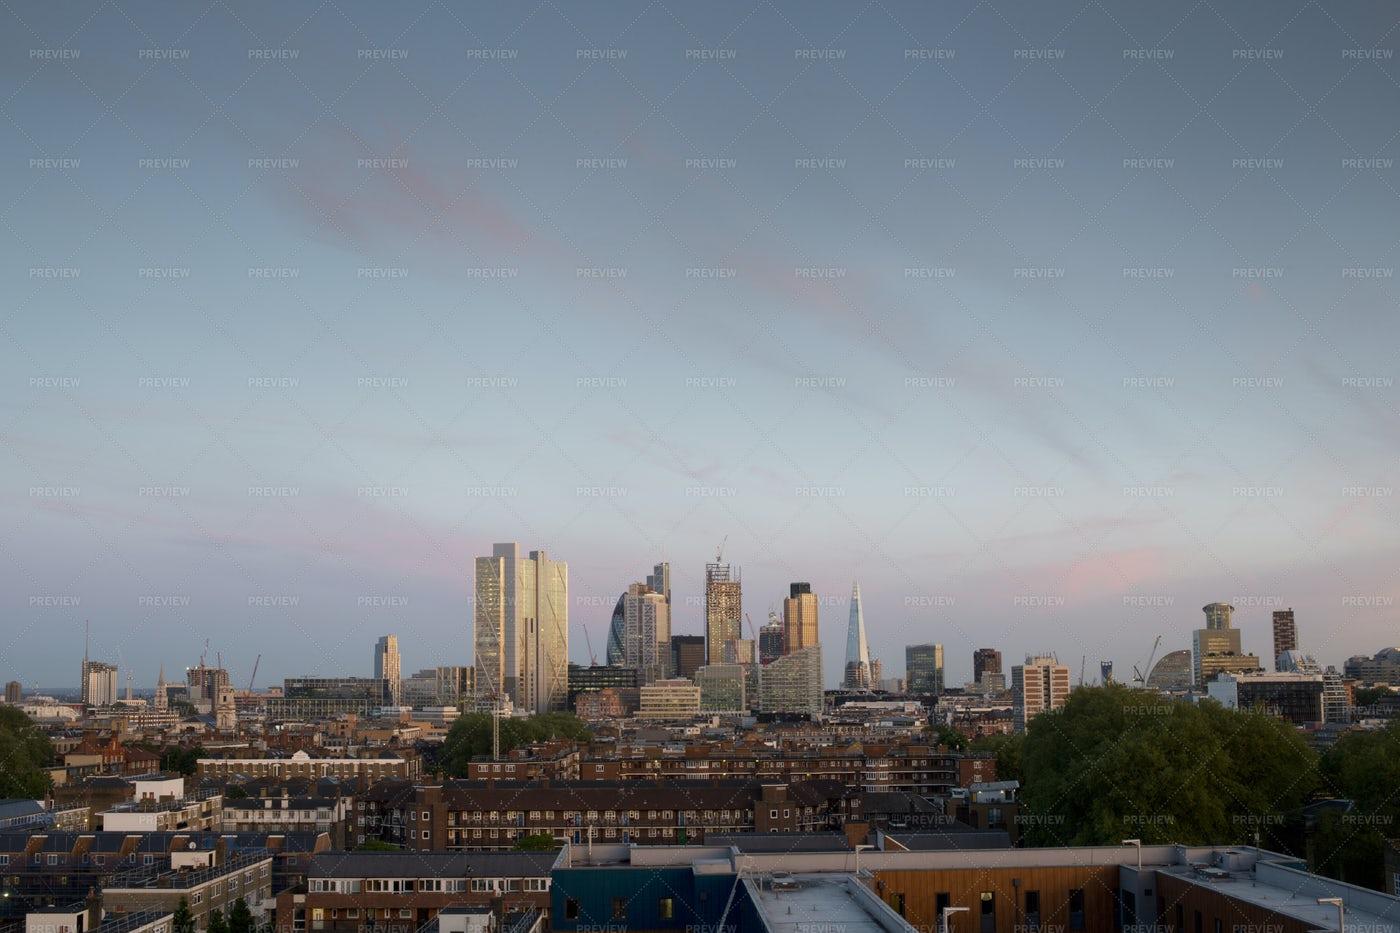 London Skyline From A Distance: Stock Photos